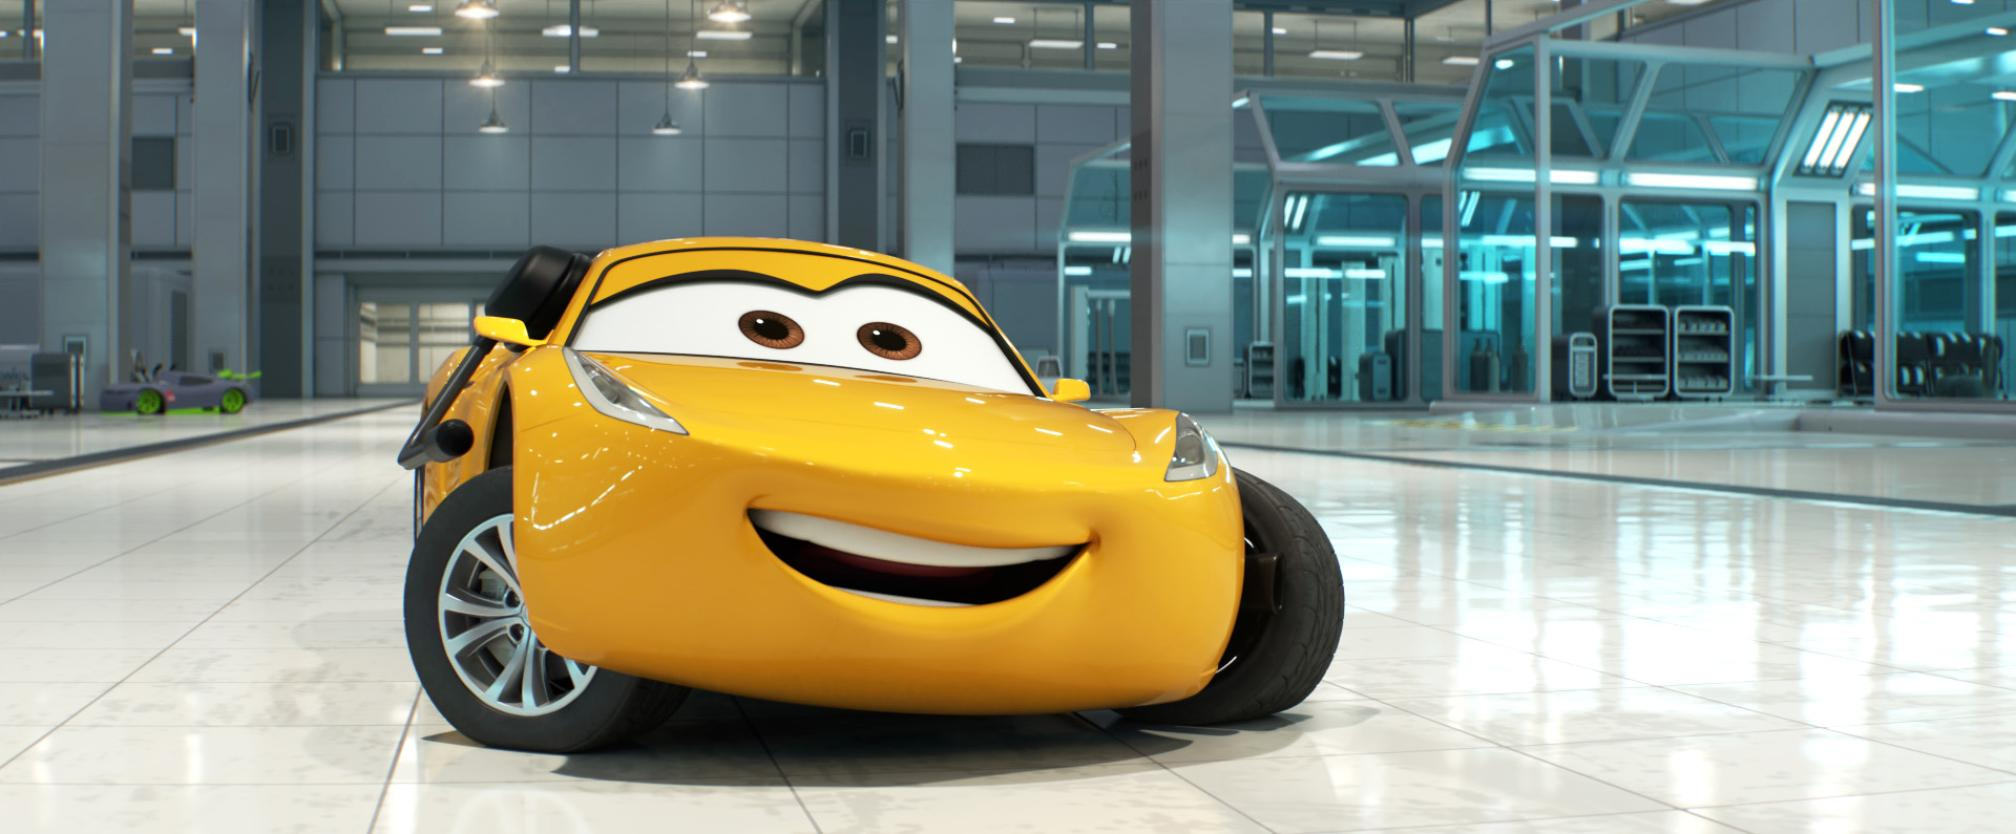 CARS 3:閃電再起劇照 3